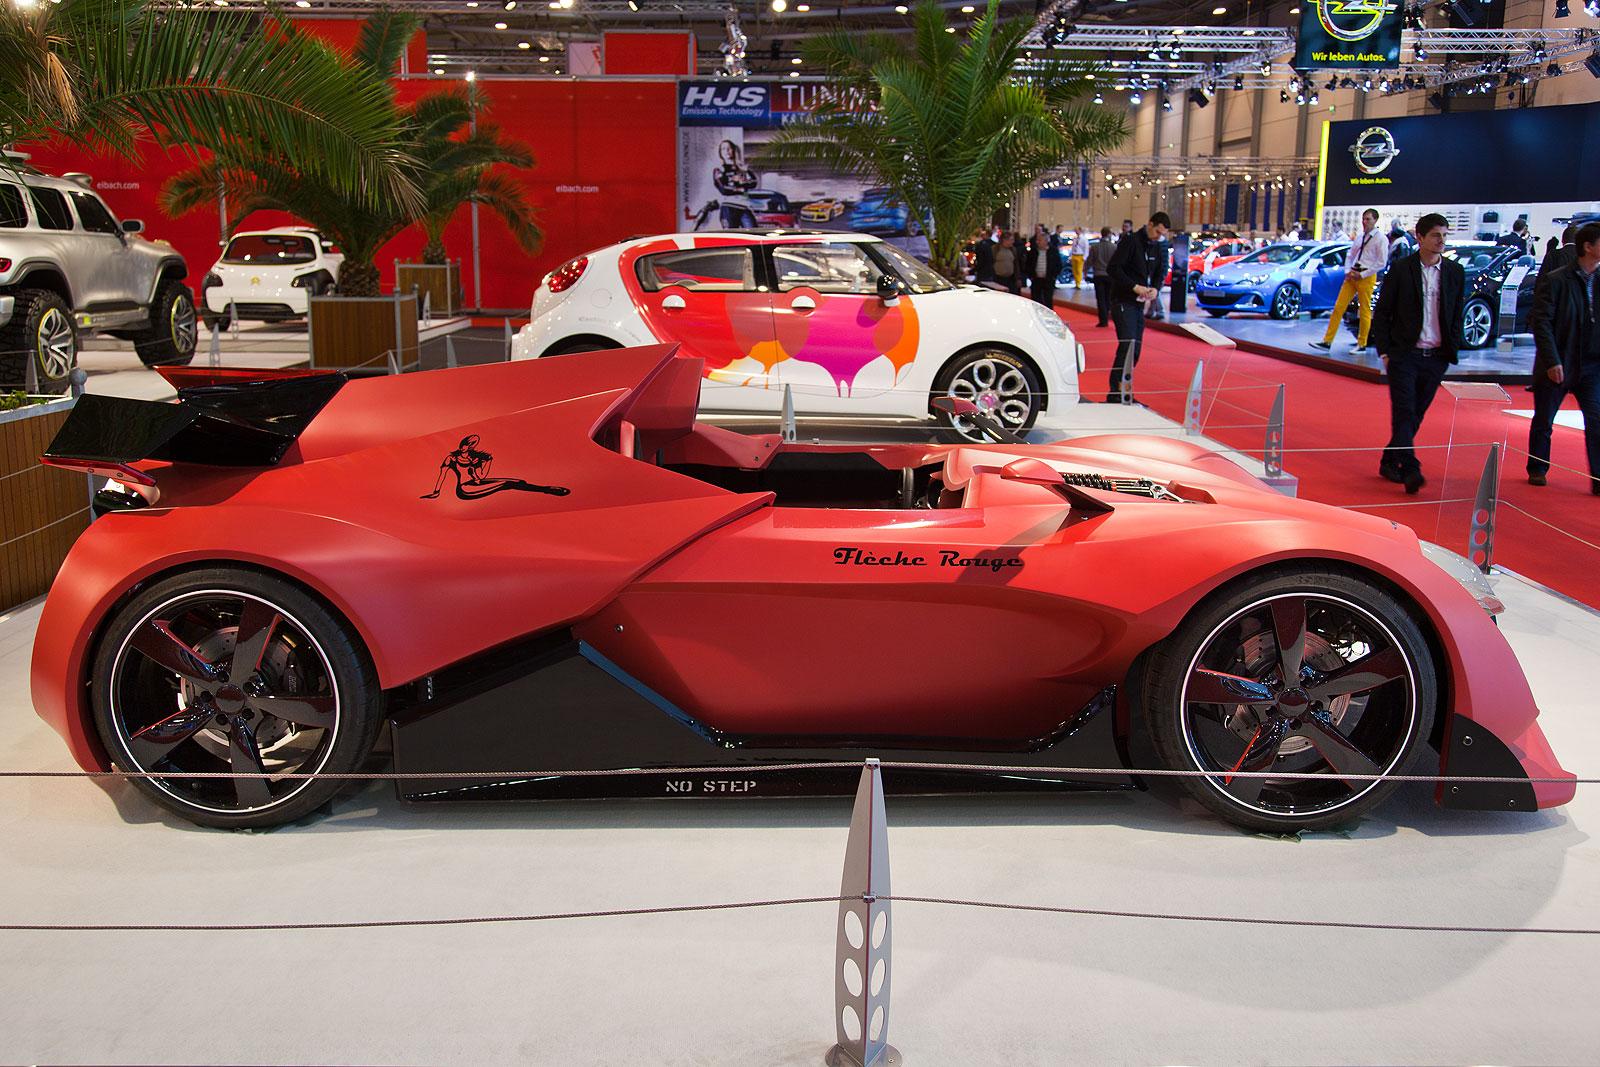 foto essen motor show 2013 sonderschau automobil design sbarro fl che rouge vergr ert. Black Bedroom Furniture Sets. Home Design Ideas